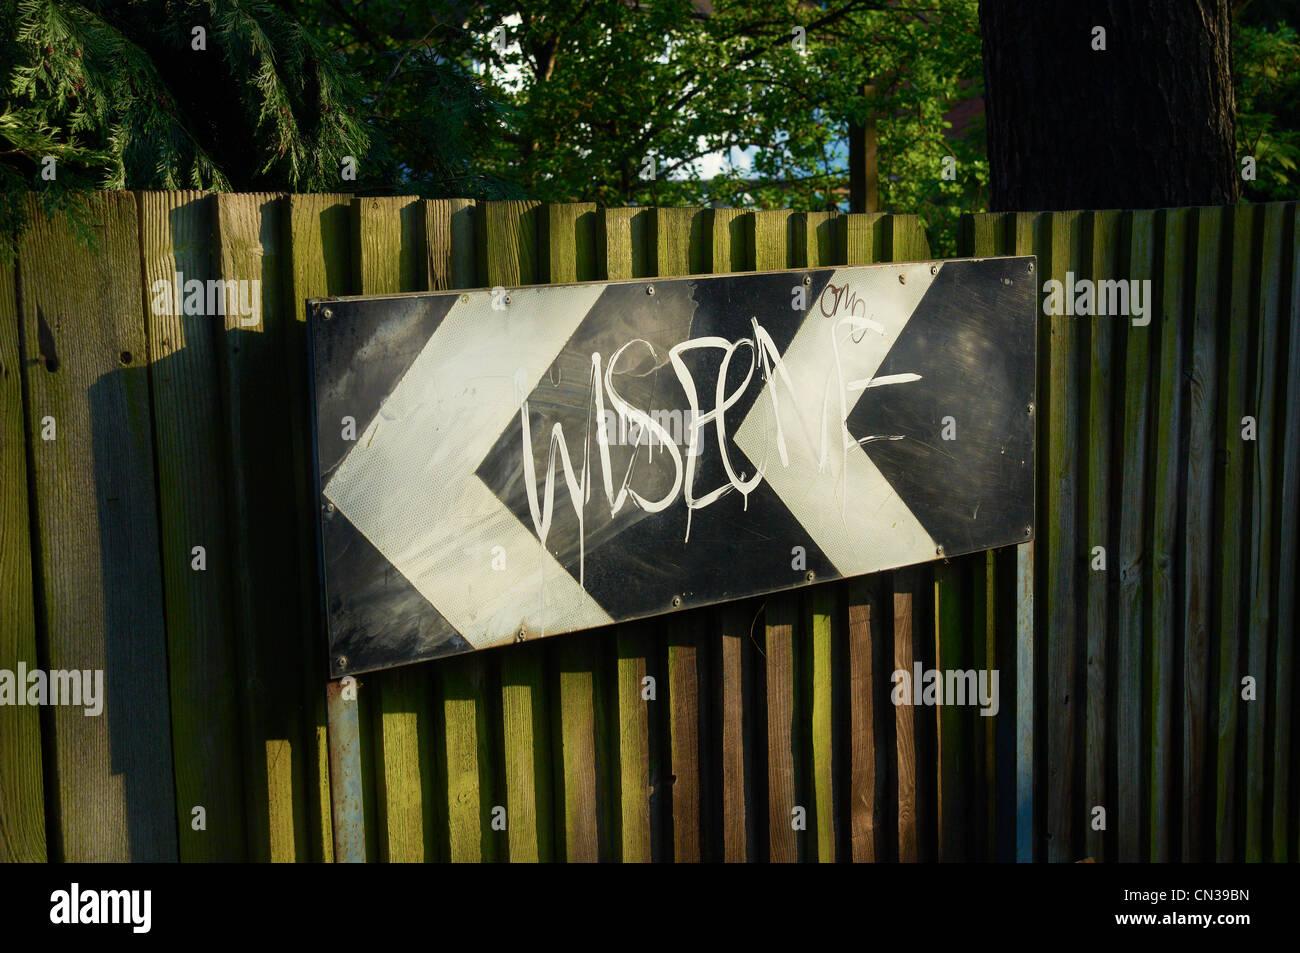 Graffiti en cartel en el cerco Imagen De Stock